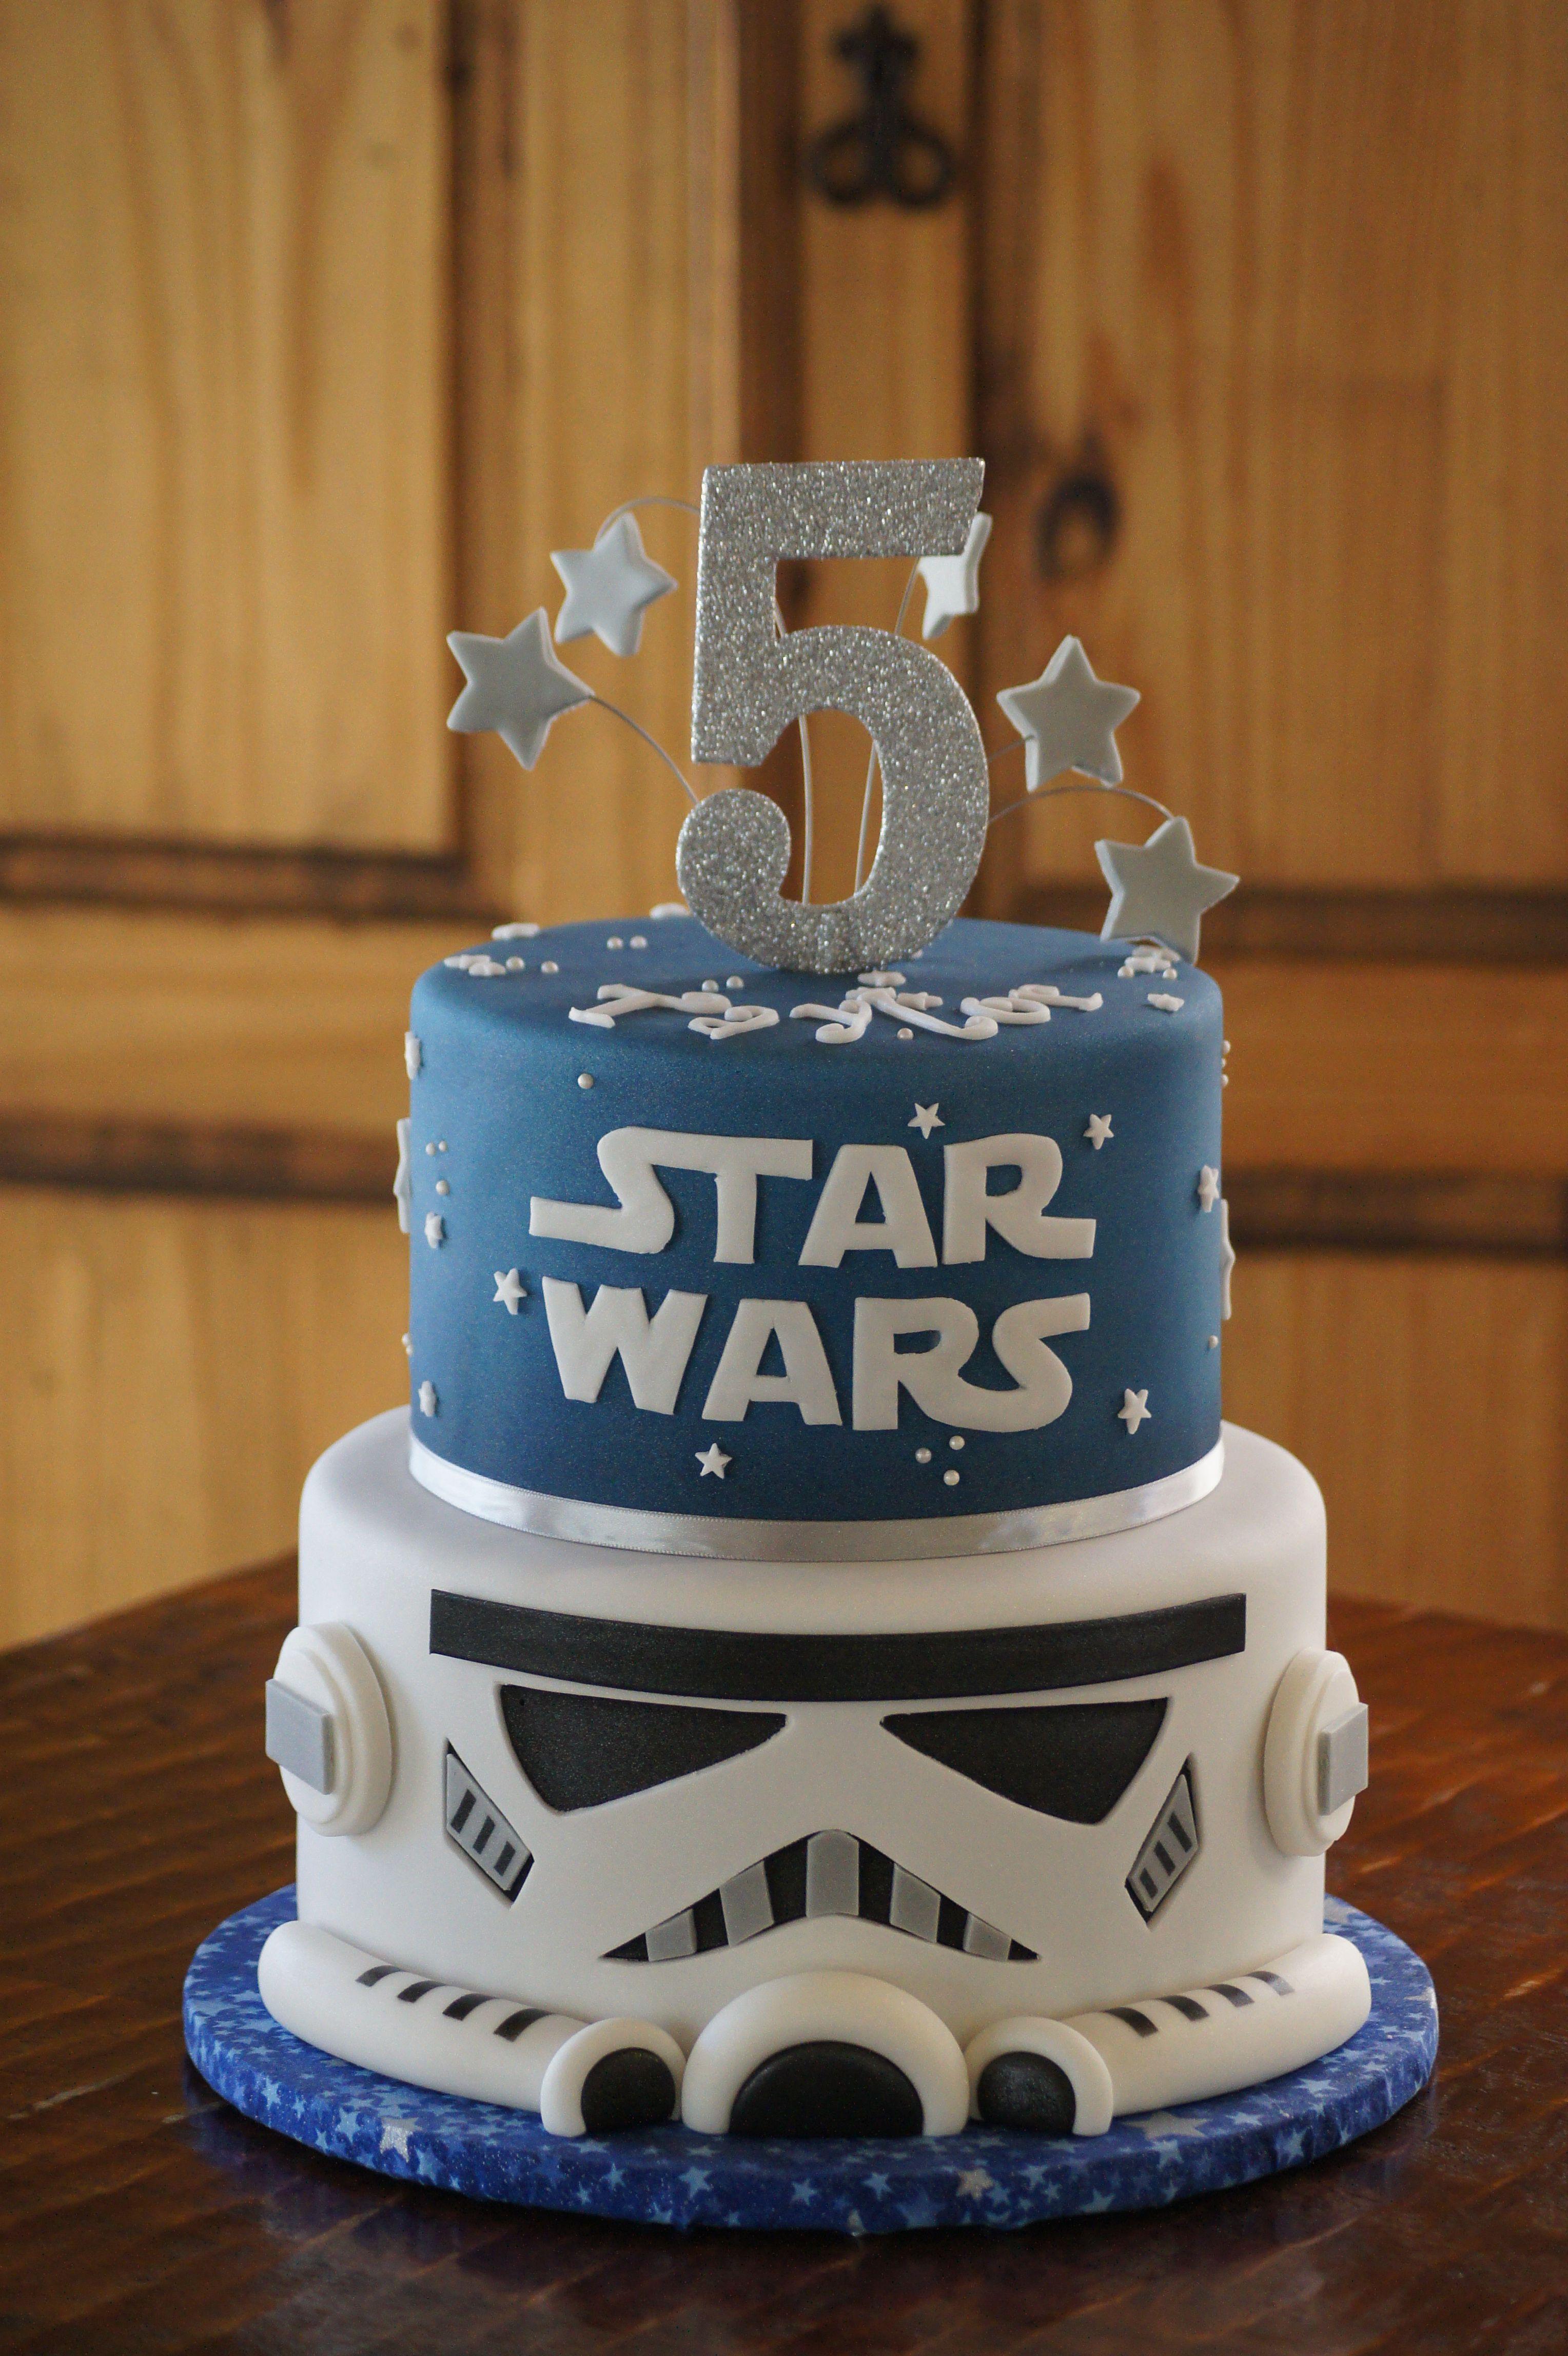 Star Wars Cake Ideas Images : Fondant Star Wars Storm Trooper birthday cake Children s ...